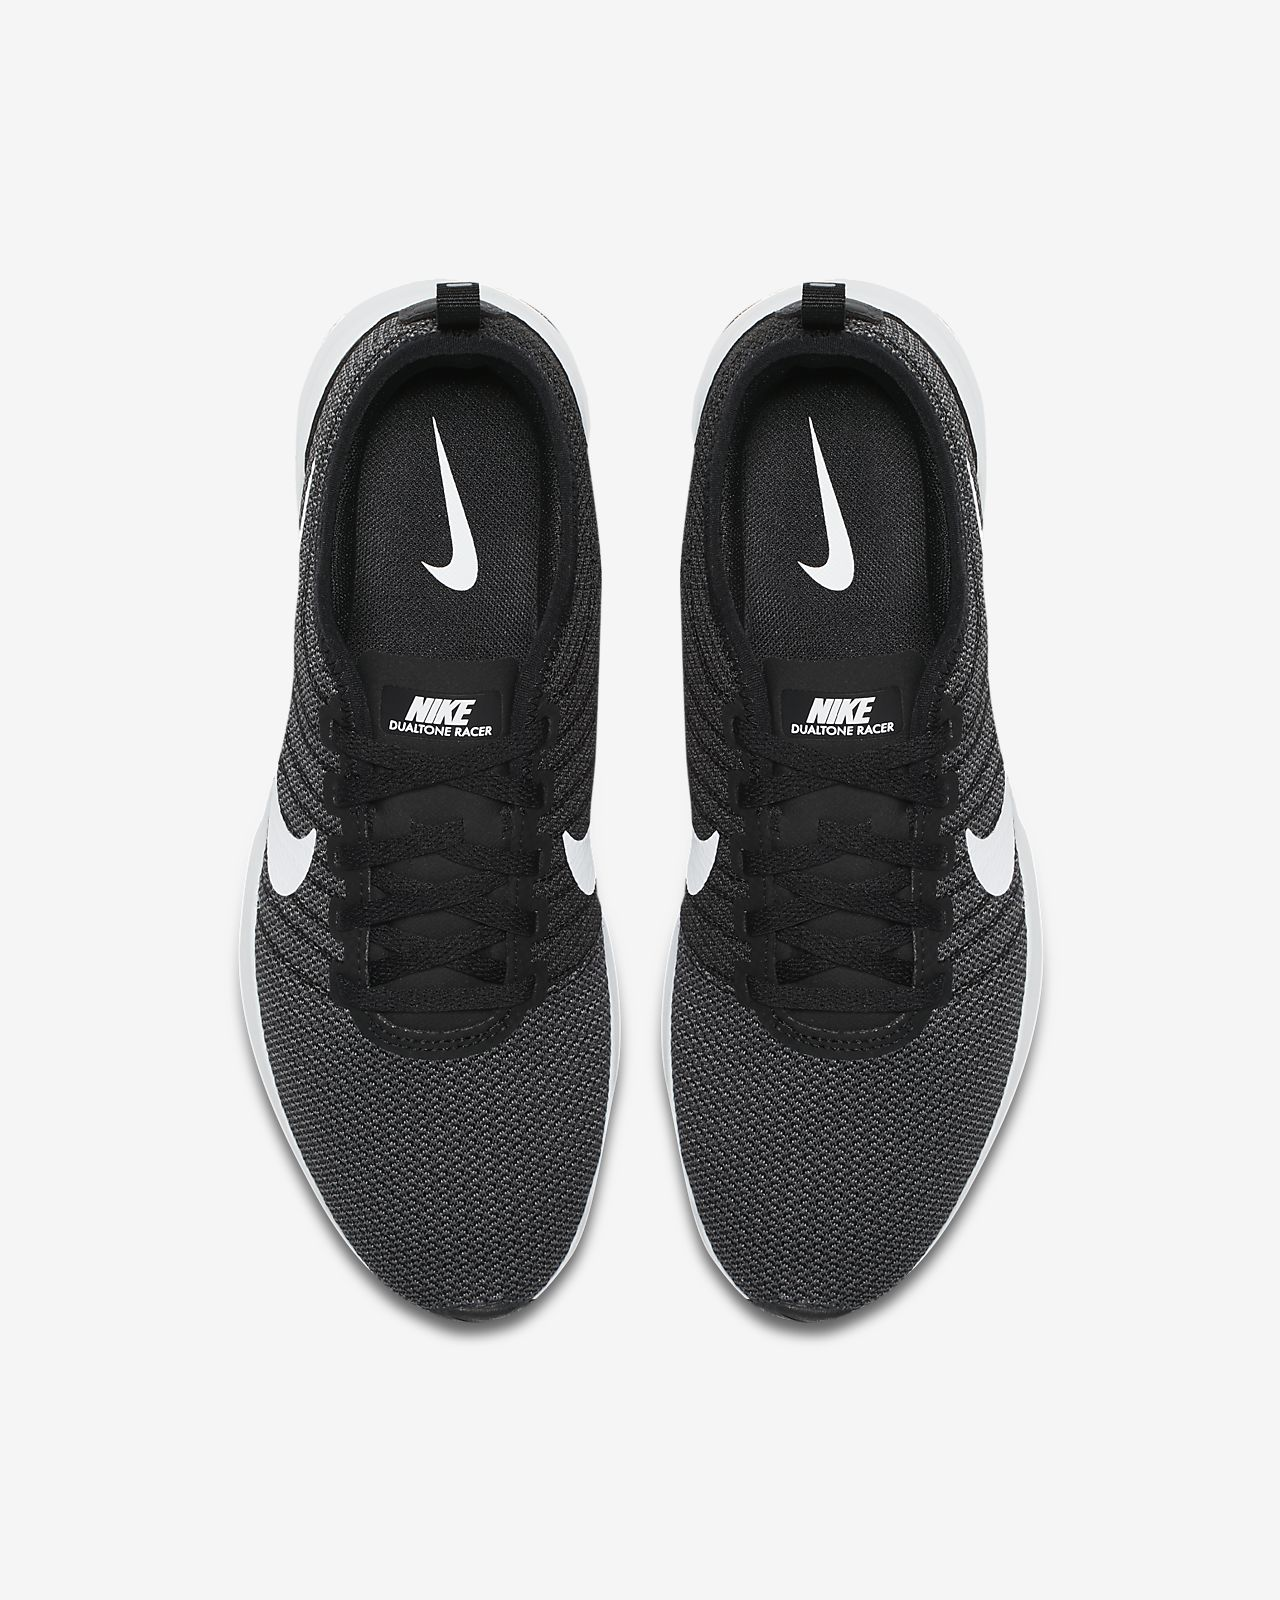 Dualtone Dualtone Shoe Women's Racer Nike Nike 34Aj5RL